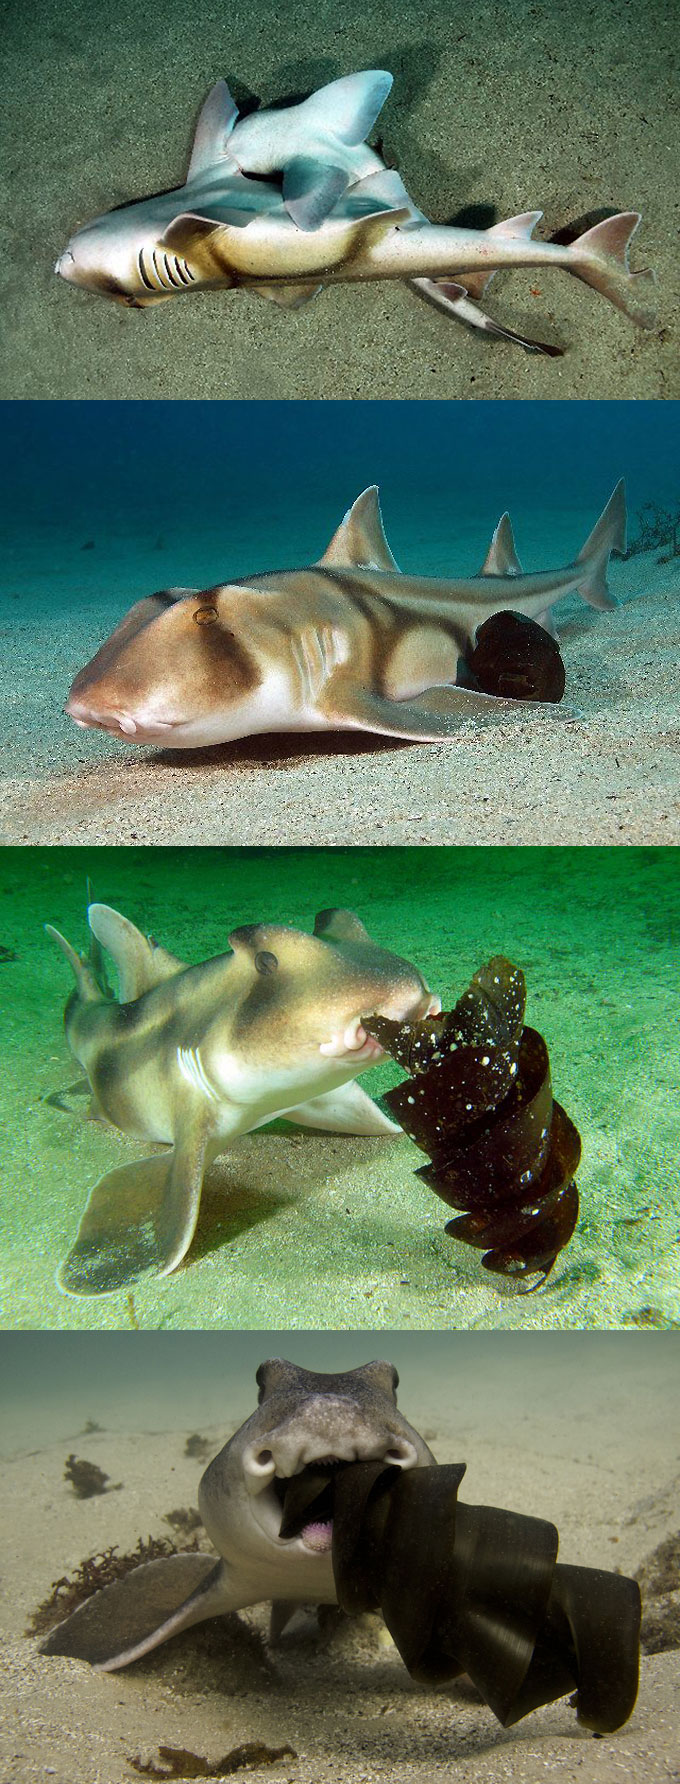 Фото: размножение австралийских рогатых акул